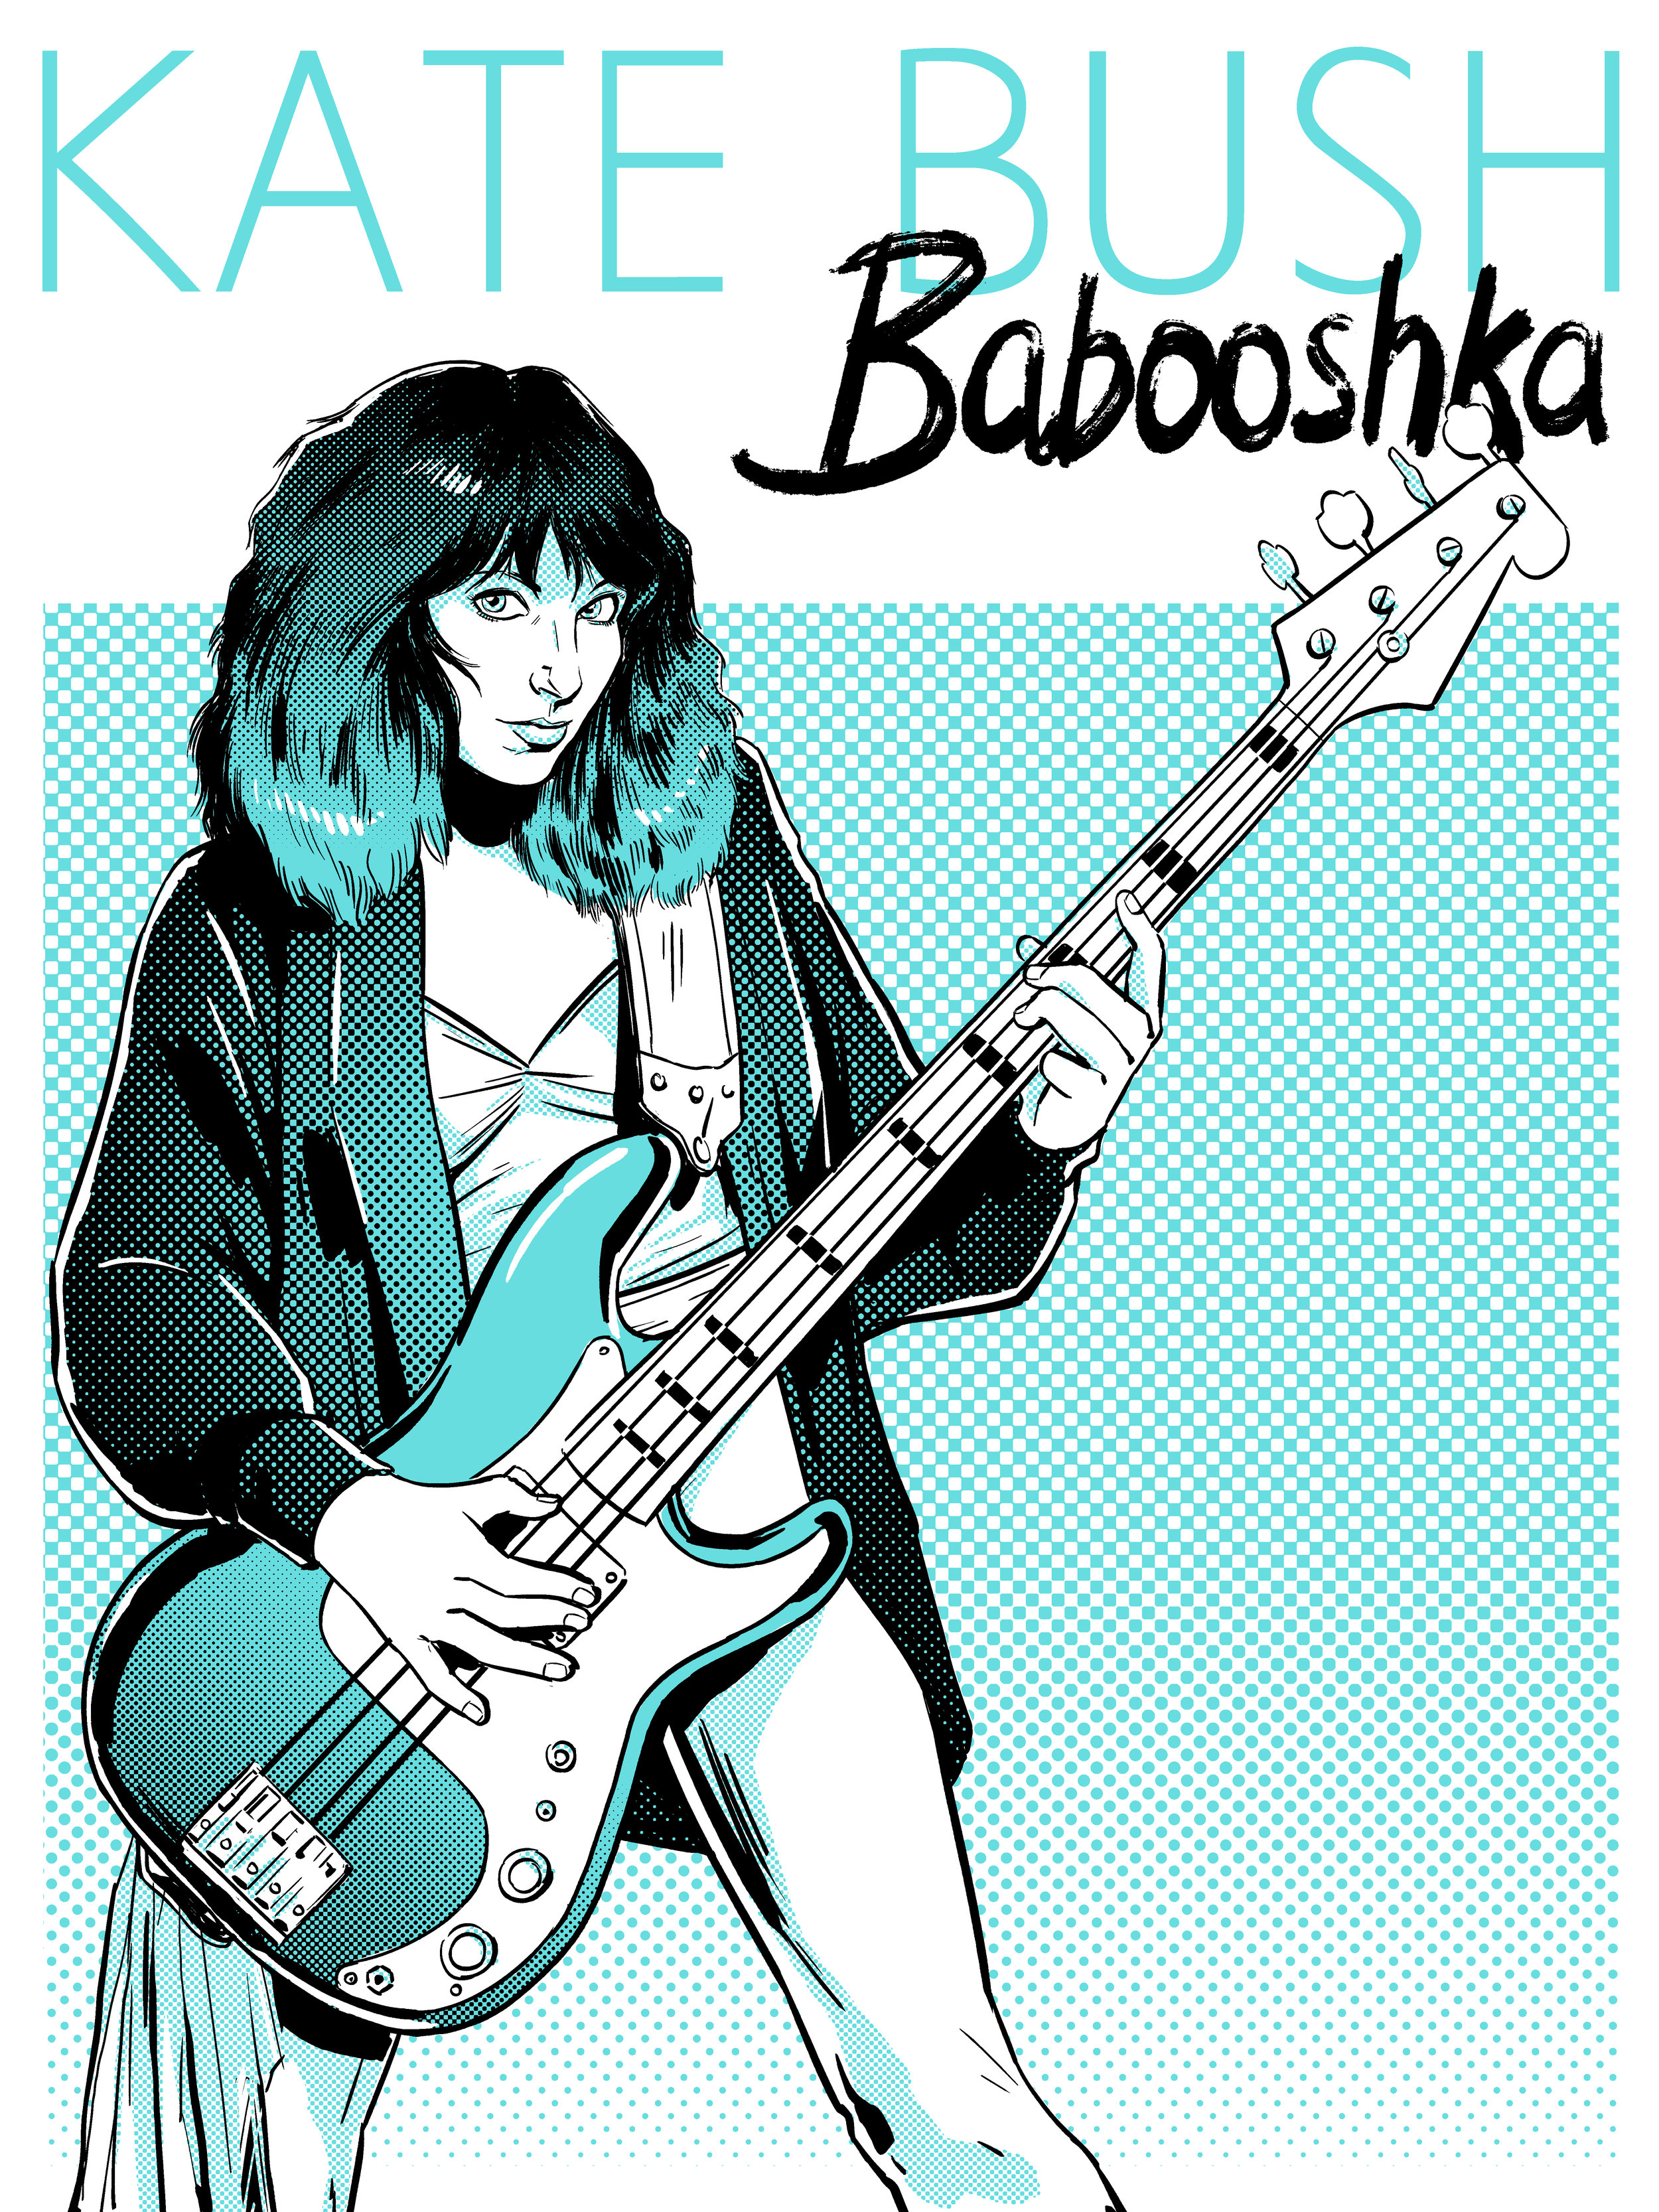 KateBush BabooshkaComposite.jpg